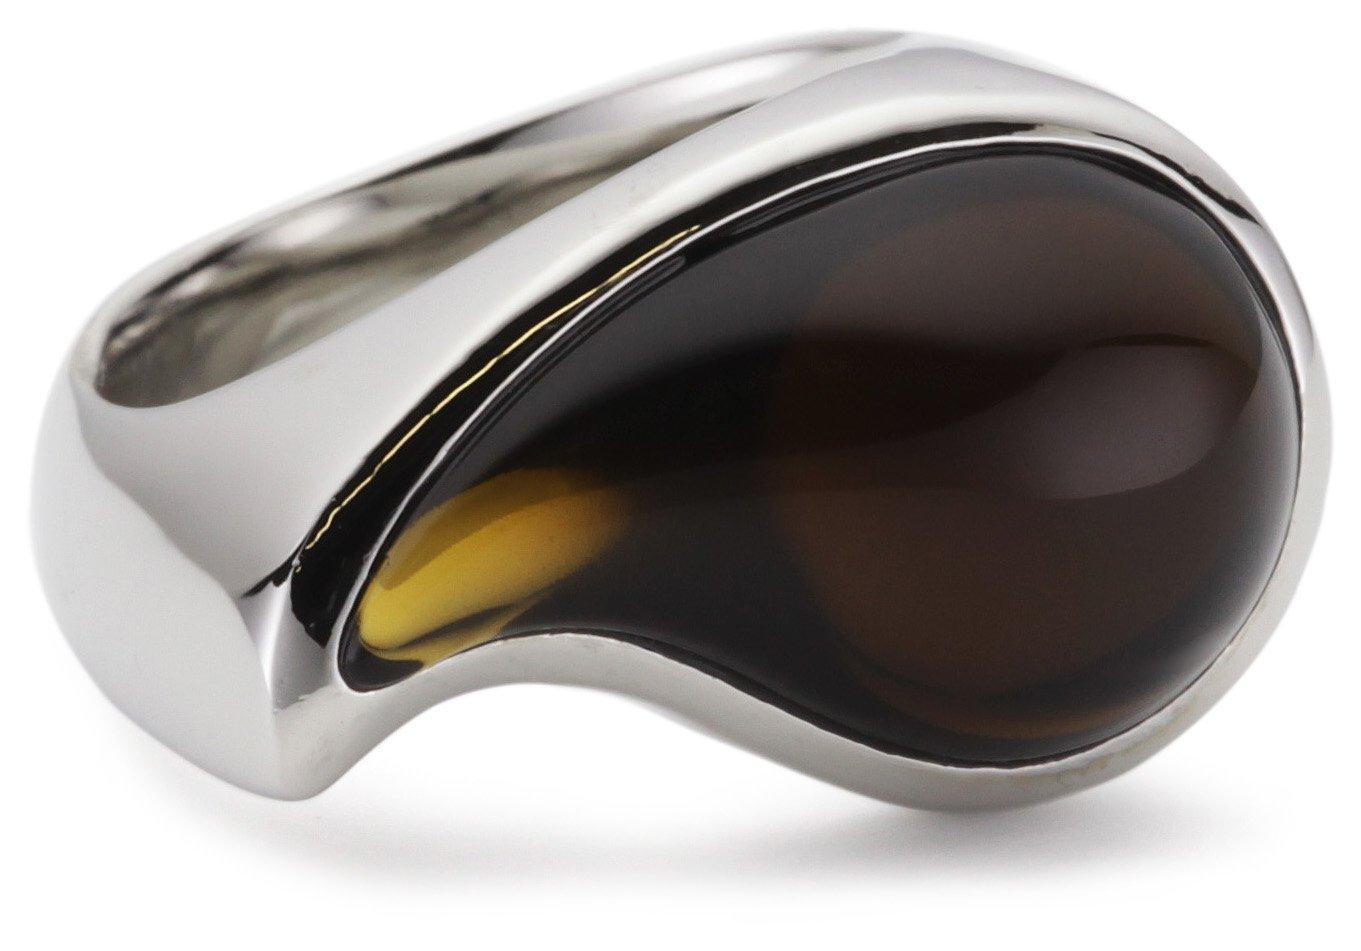 Damen-Ring Edelstahl rhodiniert Glas Glaskristall Drip Drop braun Gr.50 (15.9) ESRG11567E160